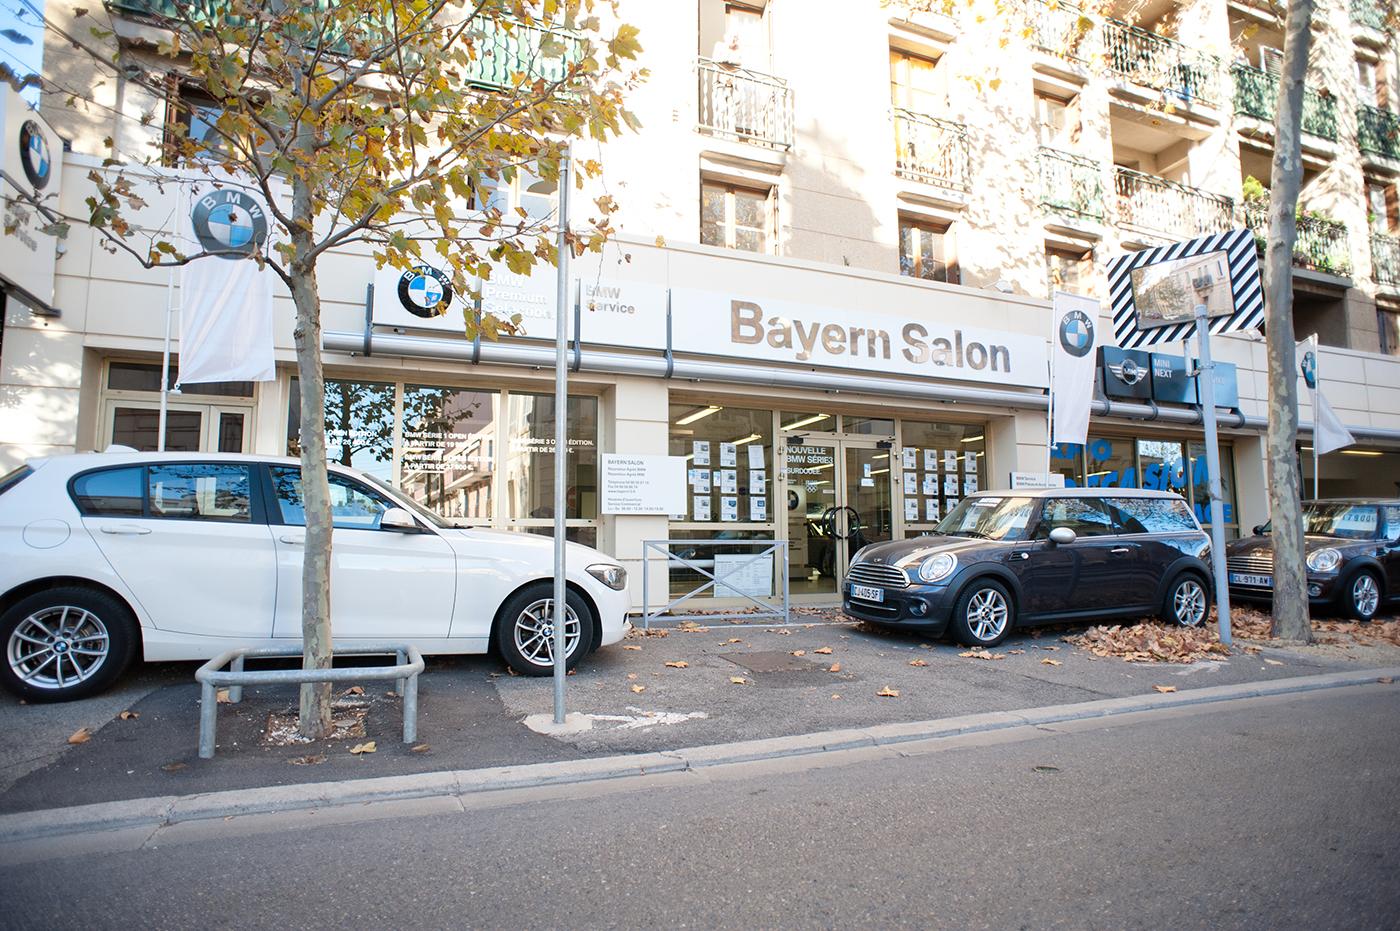 Mini occasion salon de provence bmw salon de provence autosphere - Msa salon de provence horaire ...